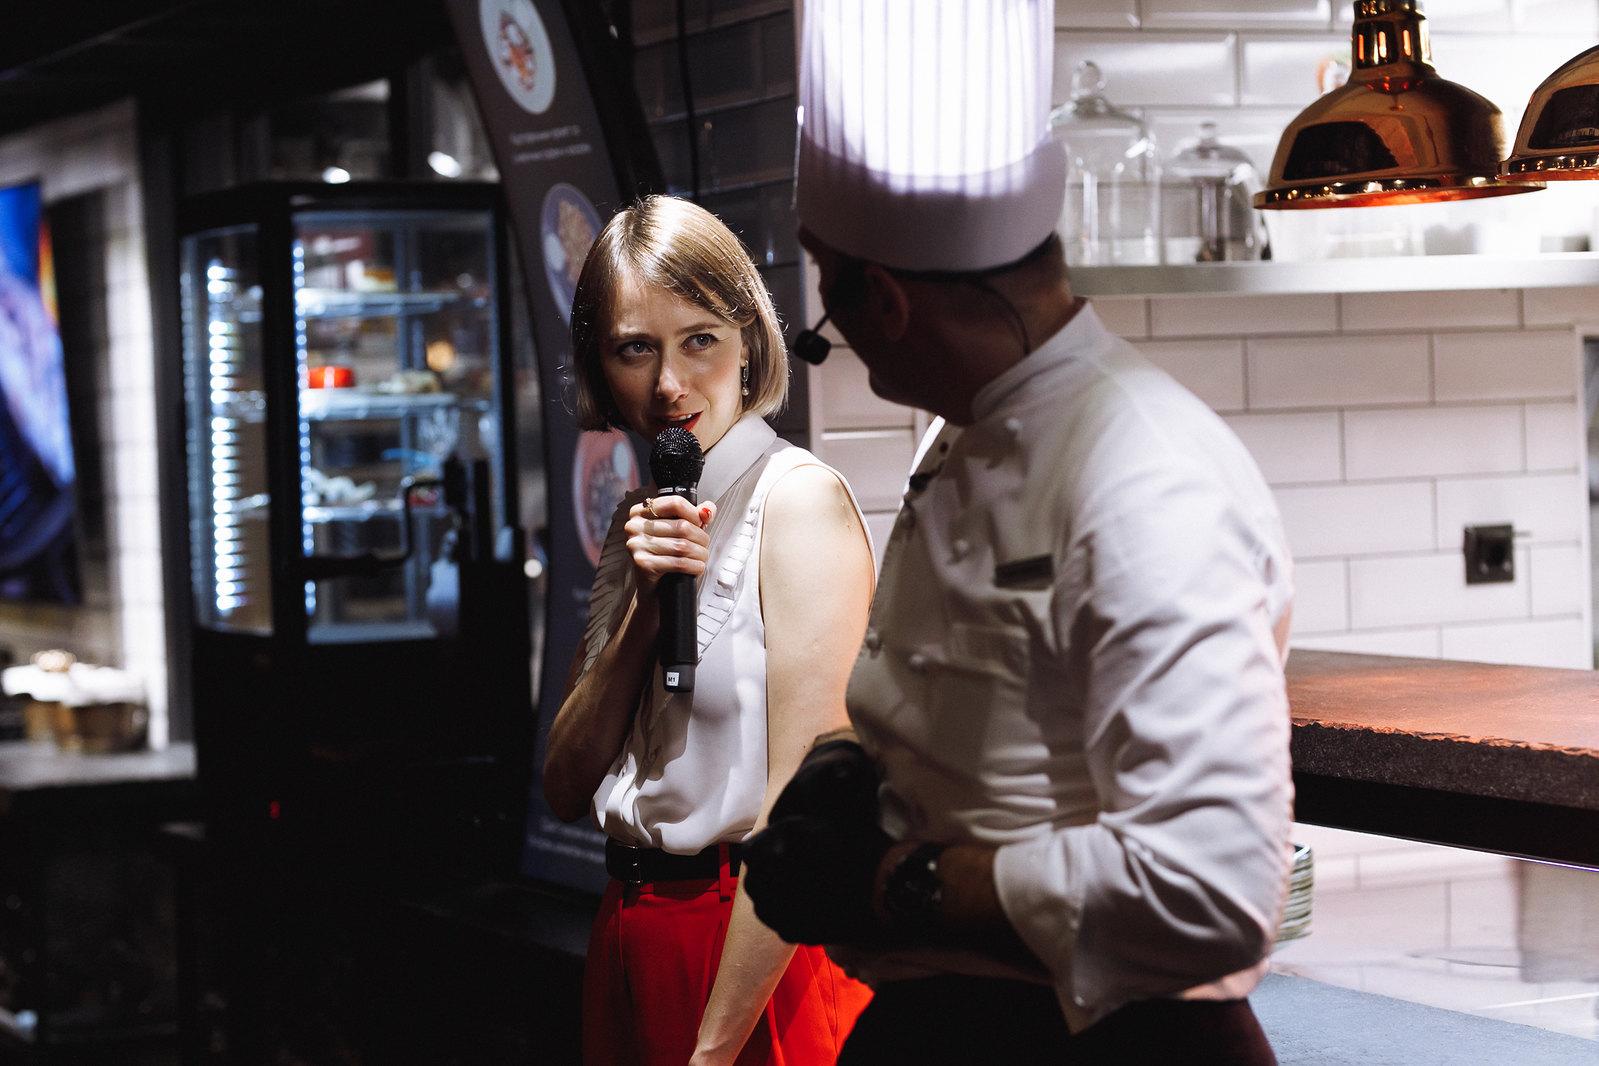 Ужин от шеф-повара Антона Каленика в AnimalFarm с marusimba1-129